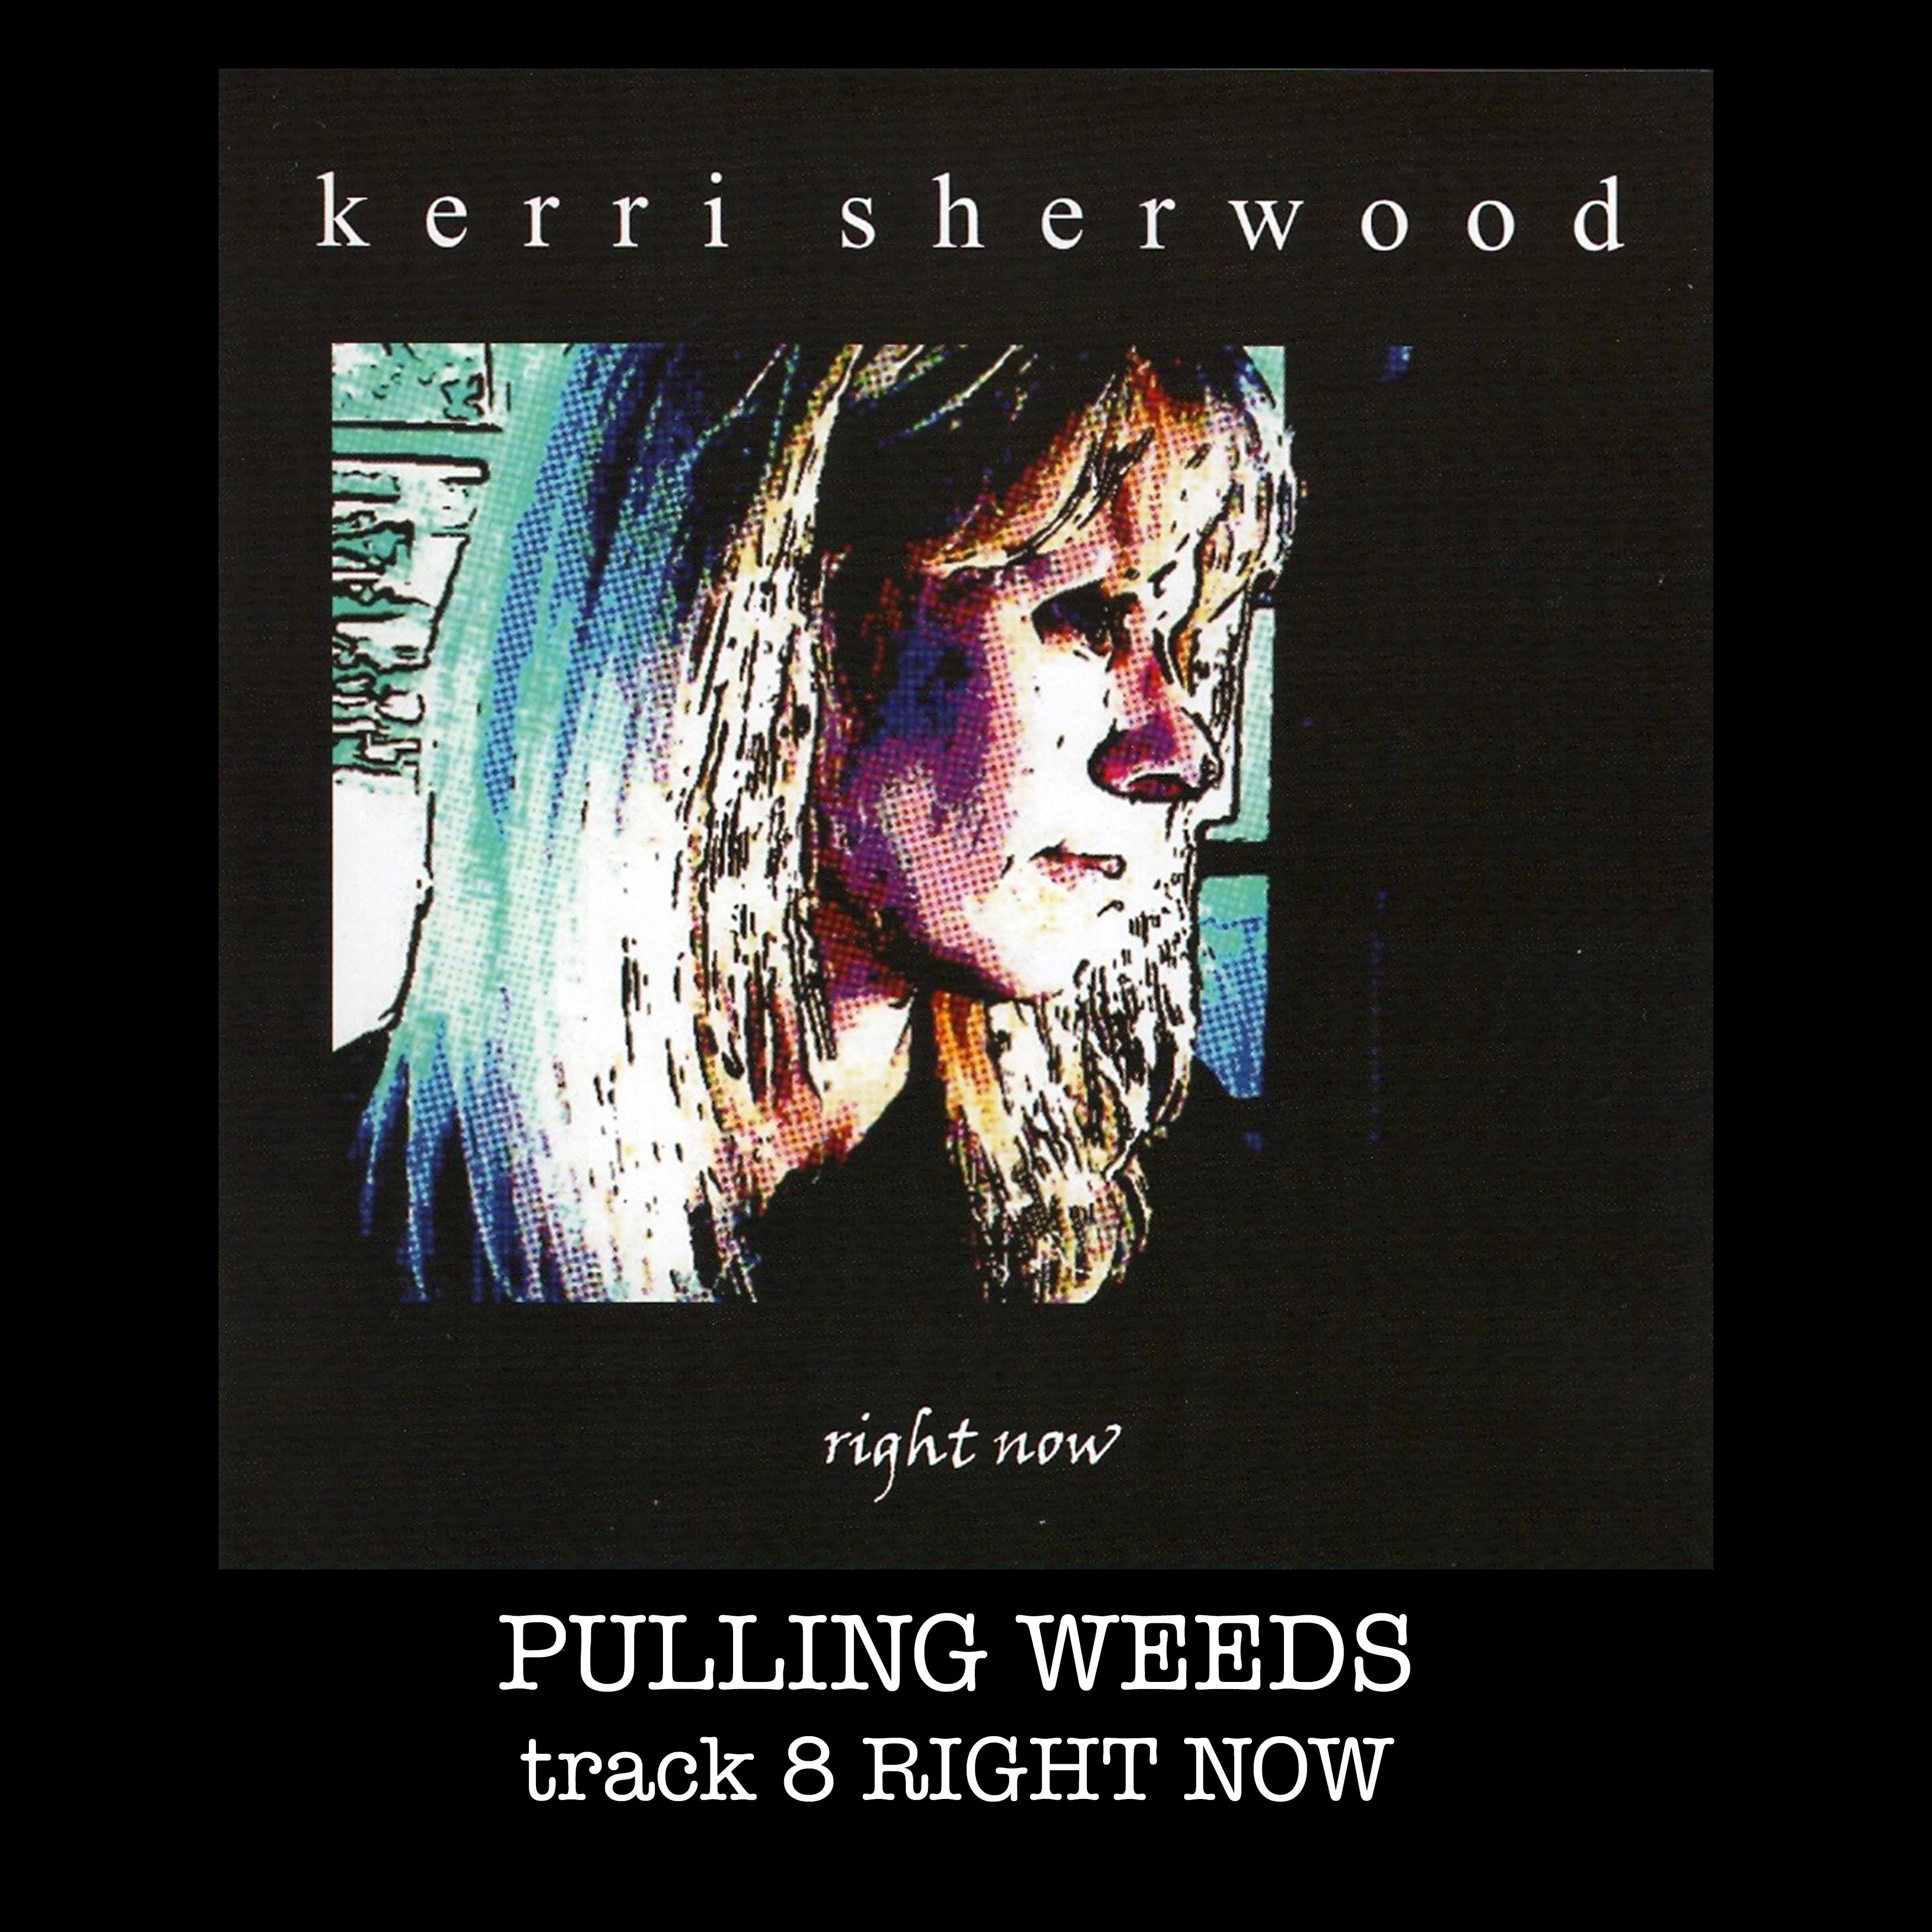 pullingweeds song box.jpg